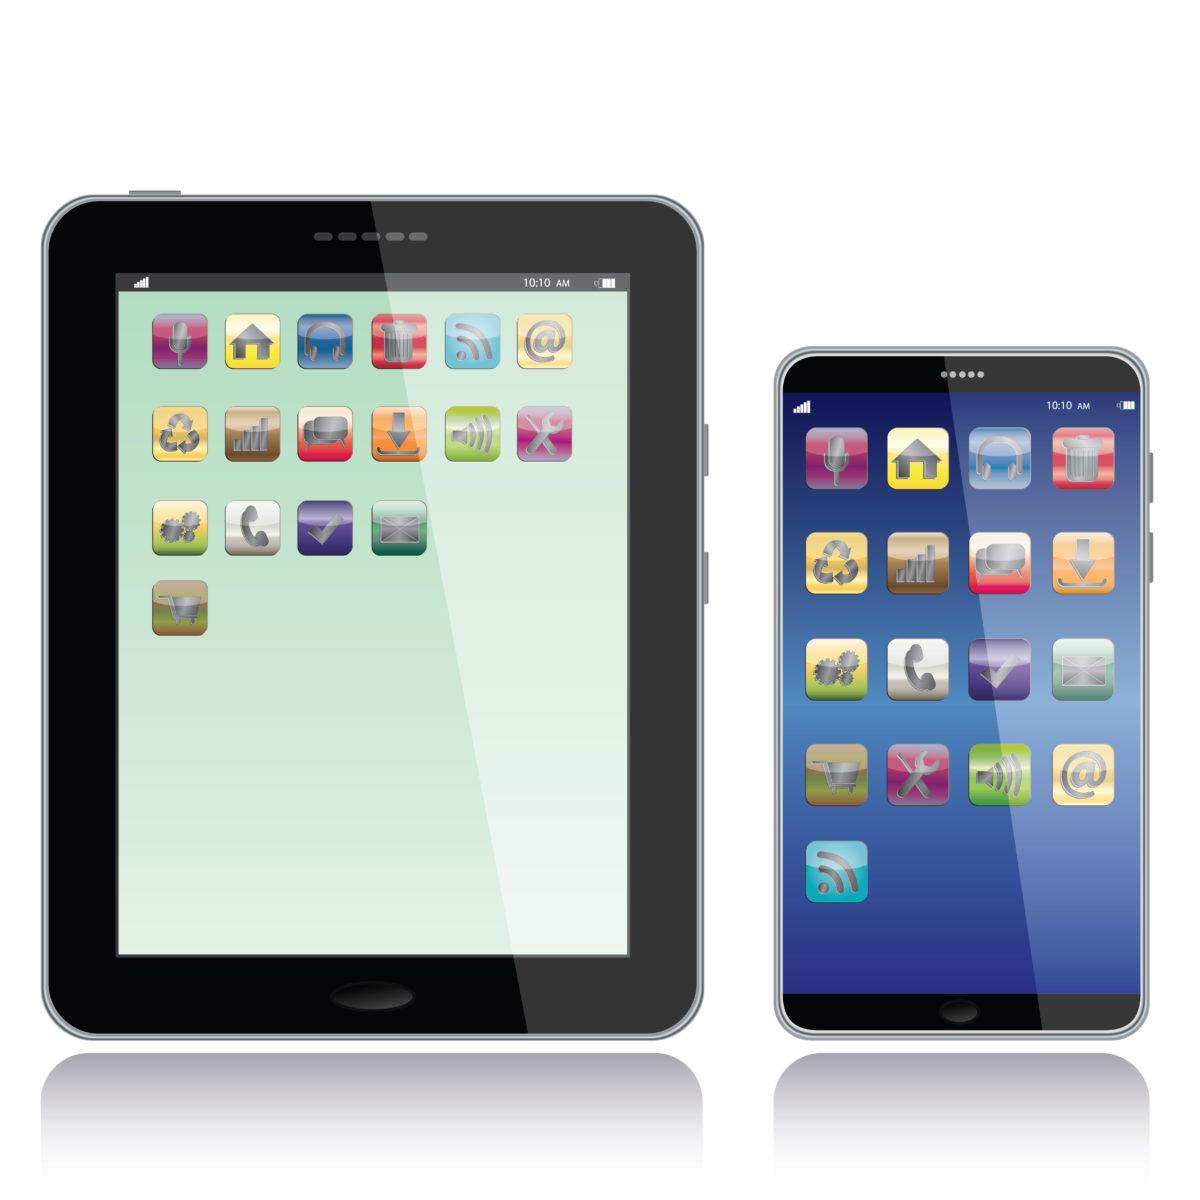 bigstock-Tablet-Pc-And-Smart-Phone-33435869-1-1200x1200.jpg